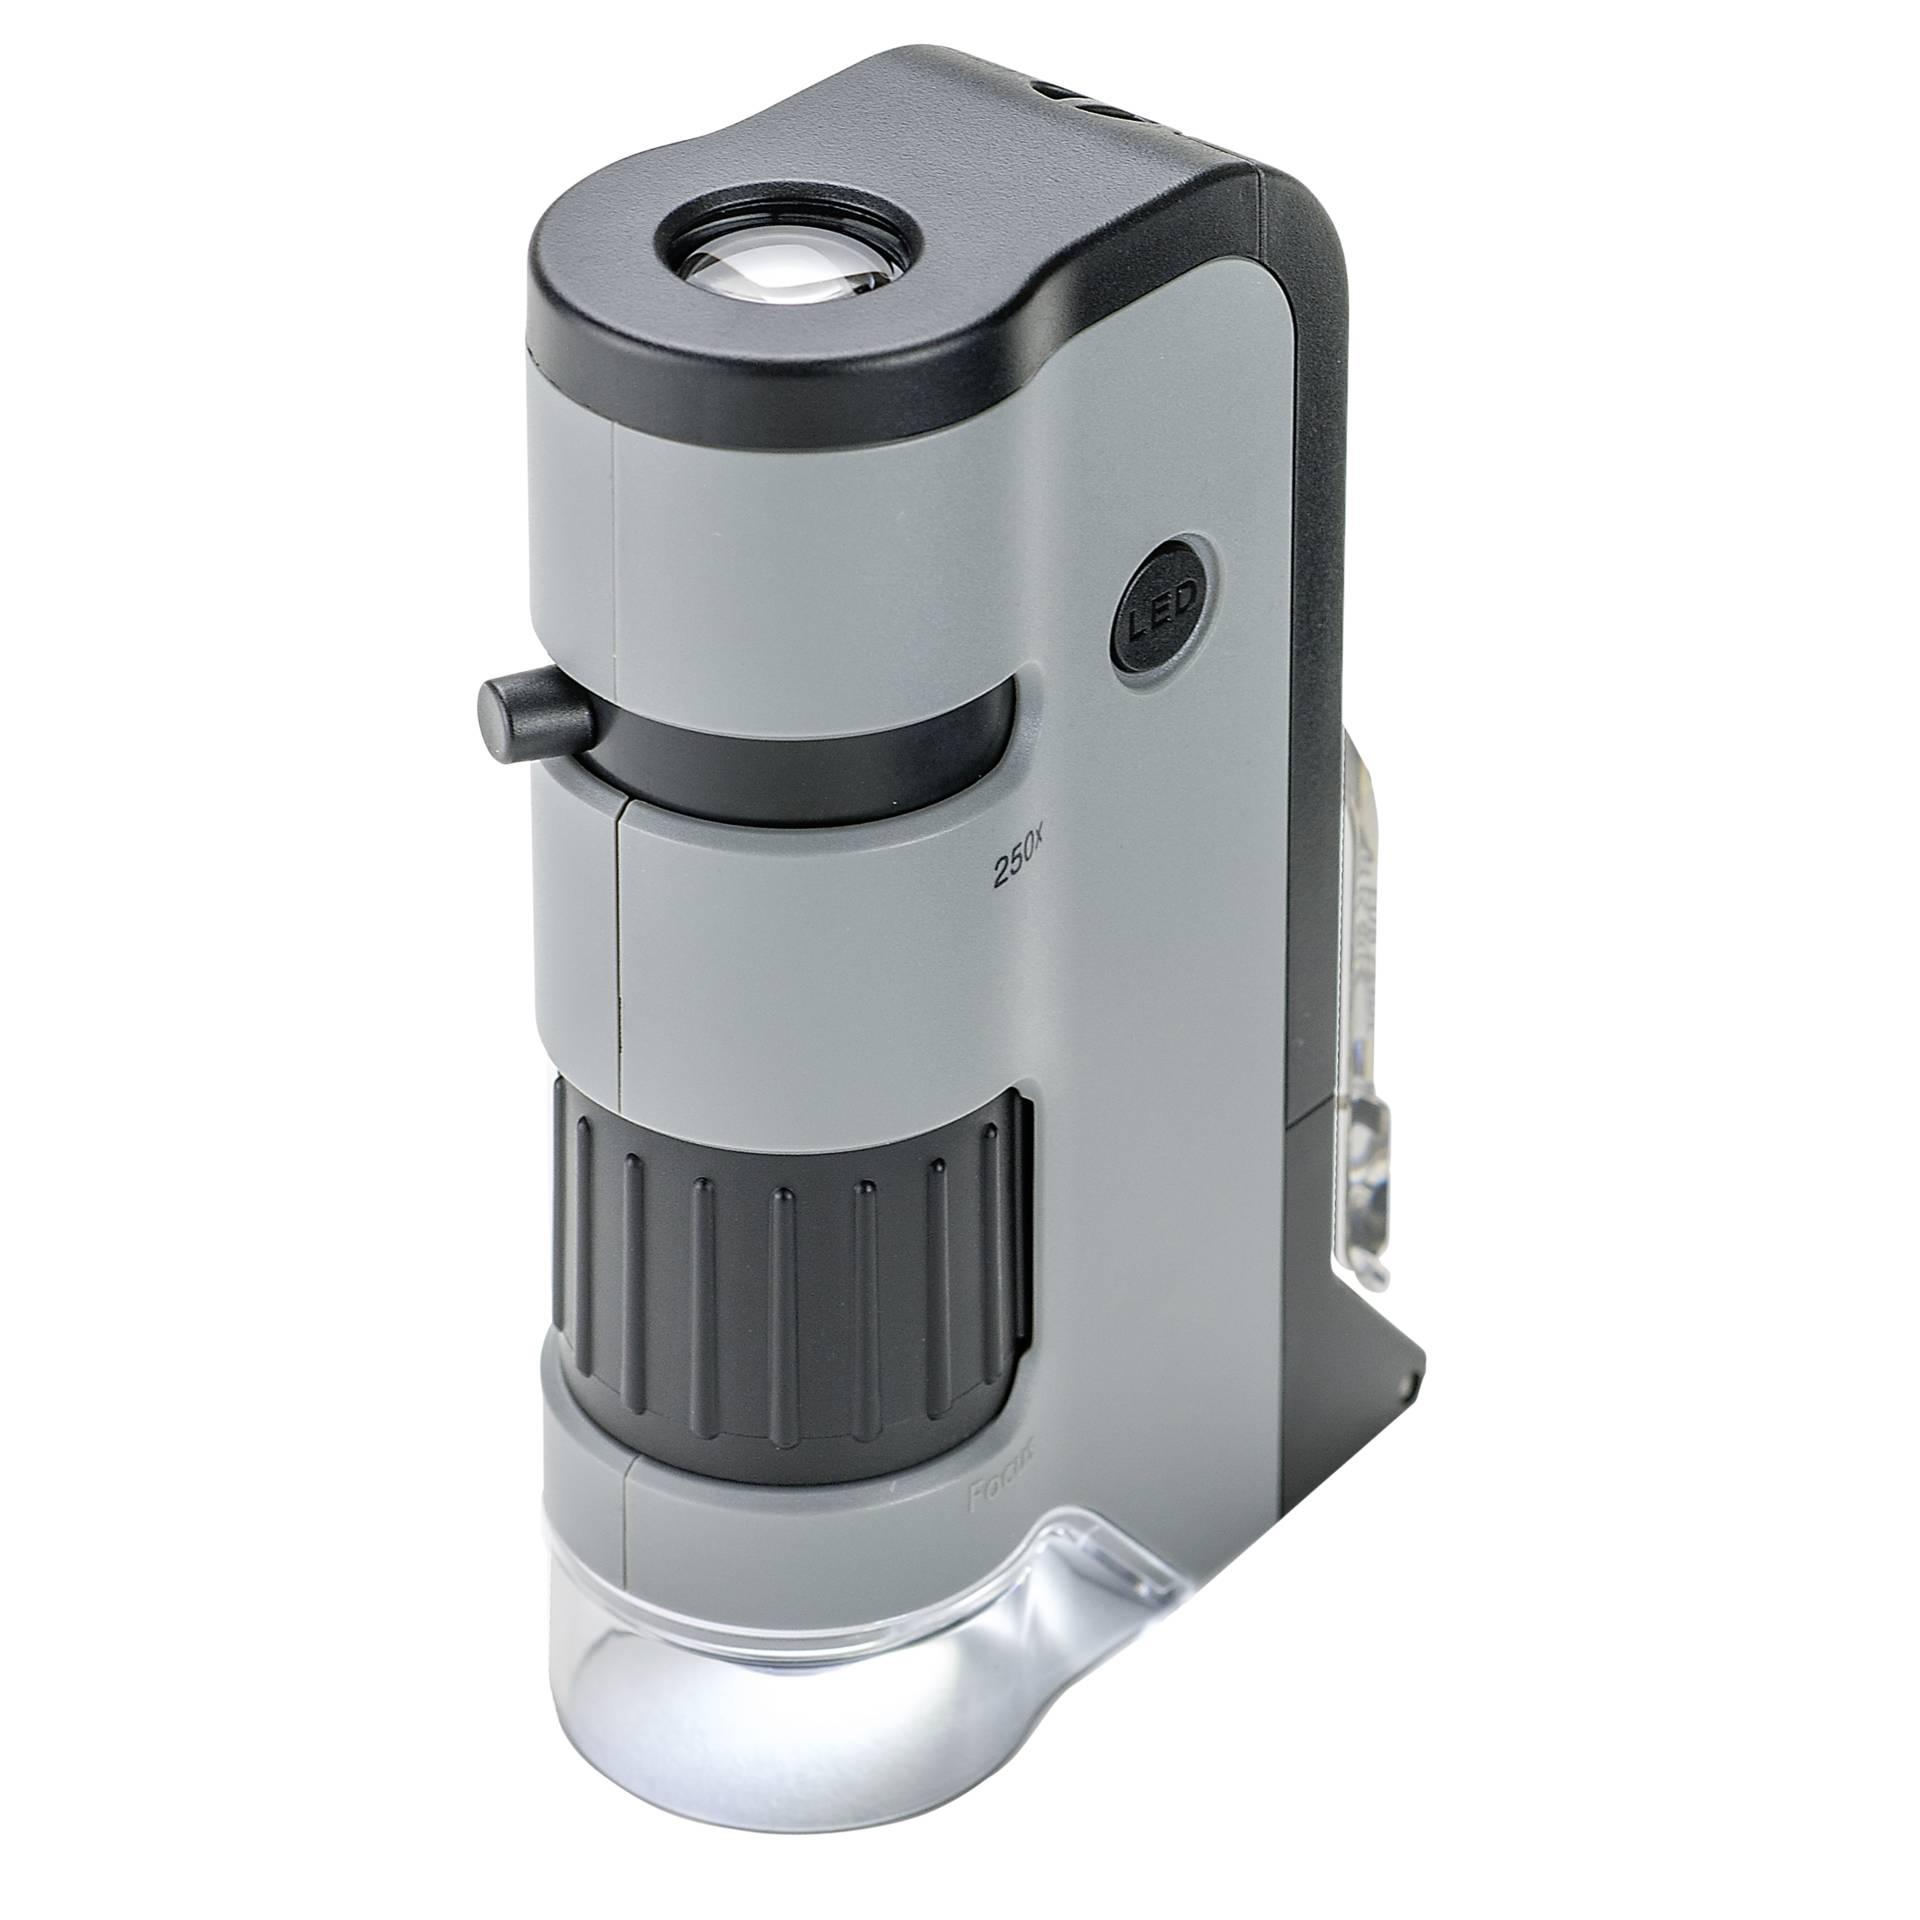 Carson MicroFlip 100x - 250x LED Pocket Mikroskop